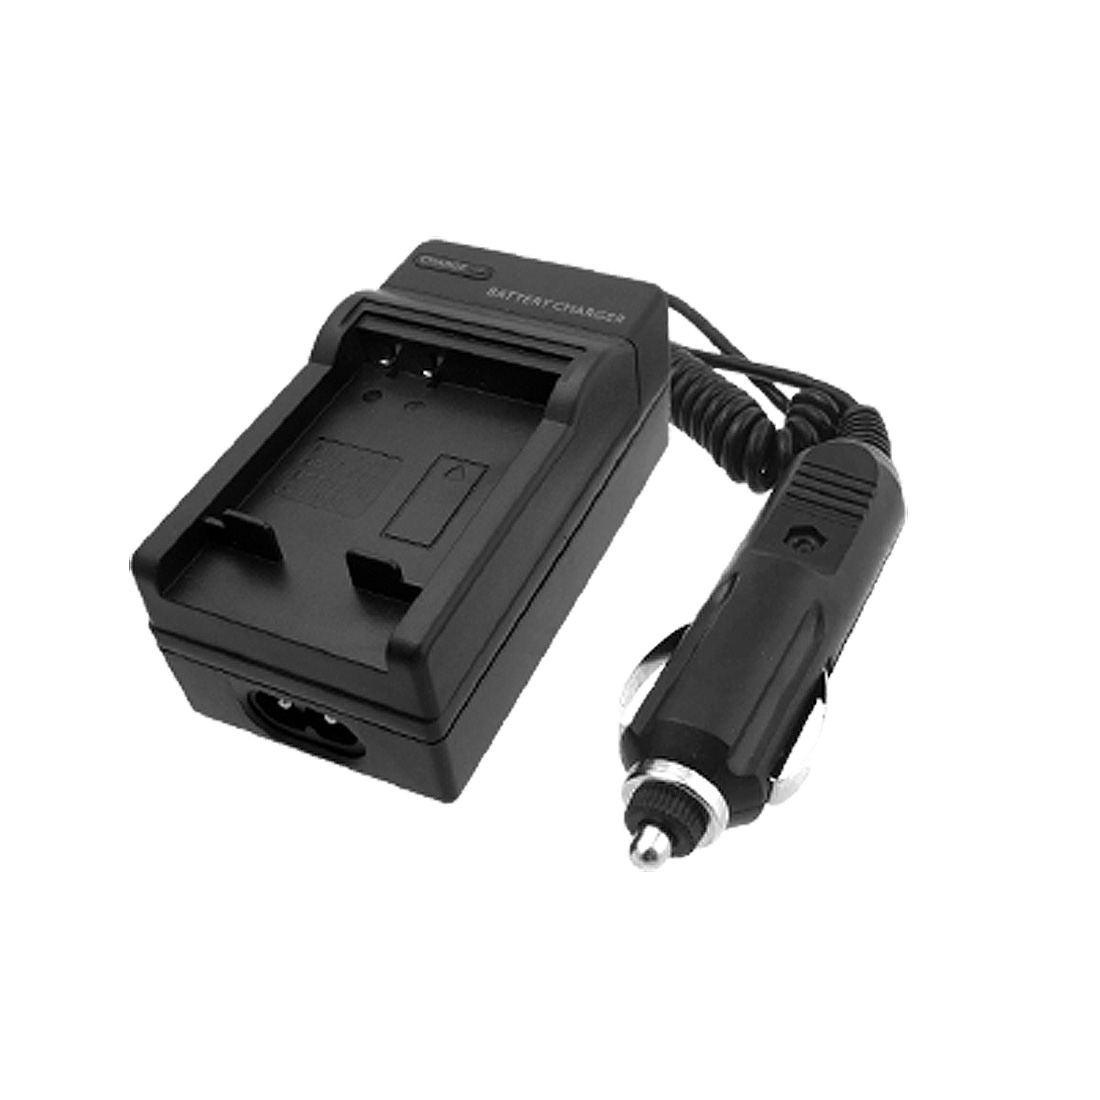 Digital Camera Battery Charger for Panasonic CGA-S005E DMW-BCC12 DMC-FX50